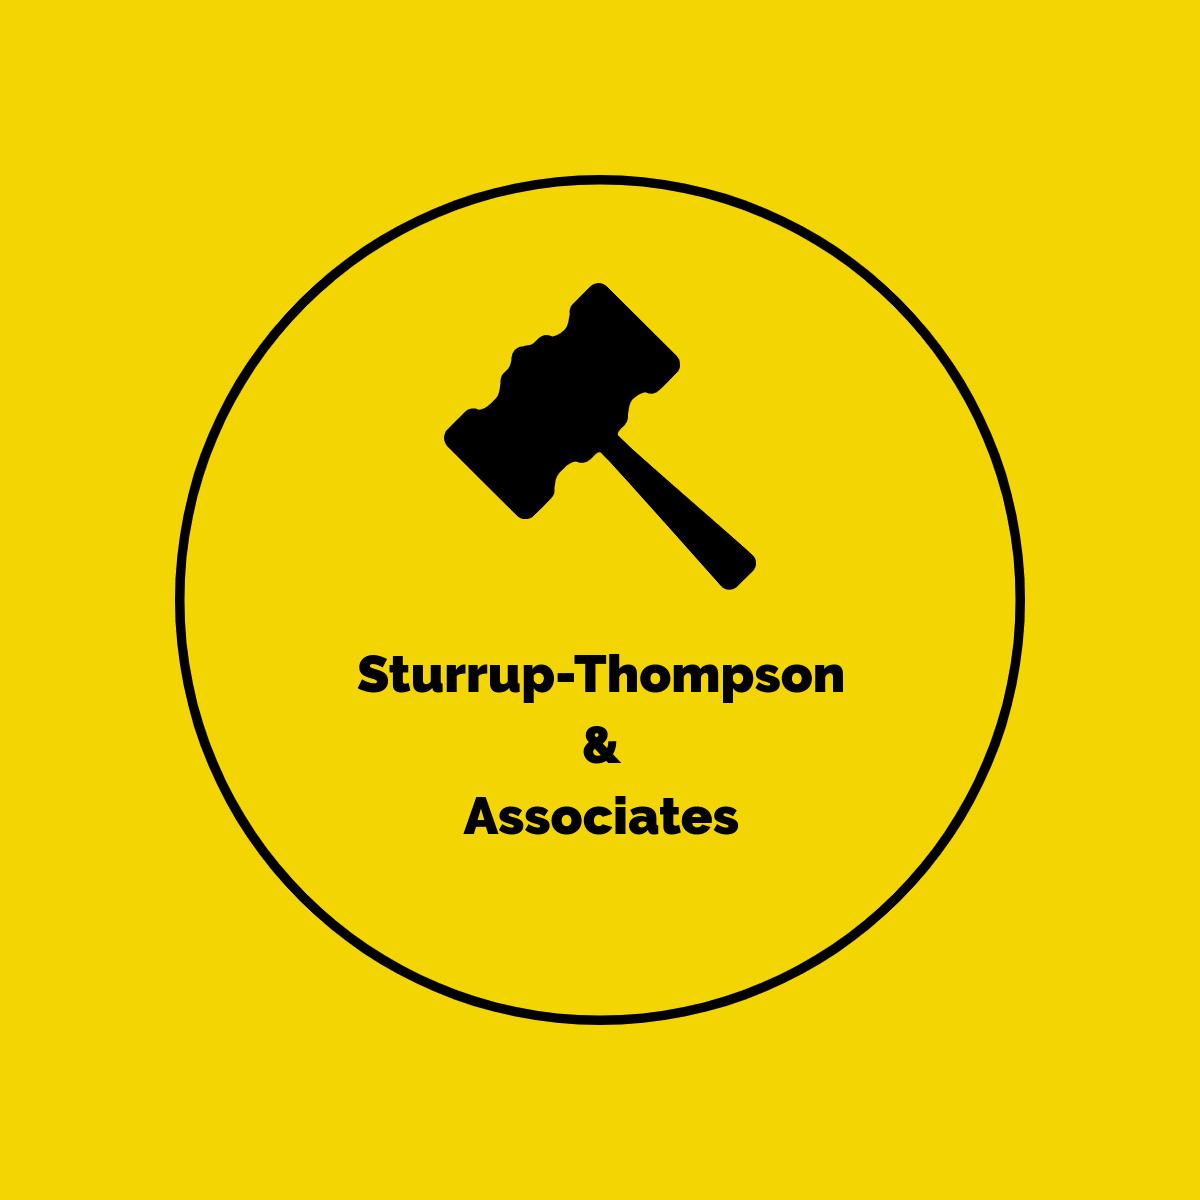 Sturrup-Thompson & Associates